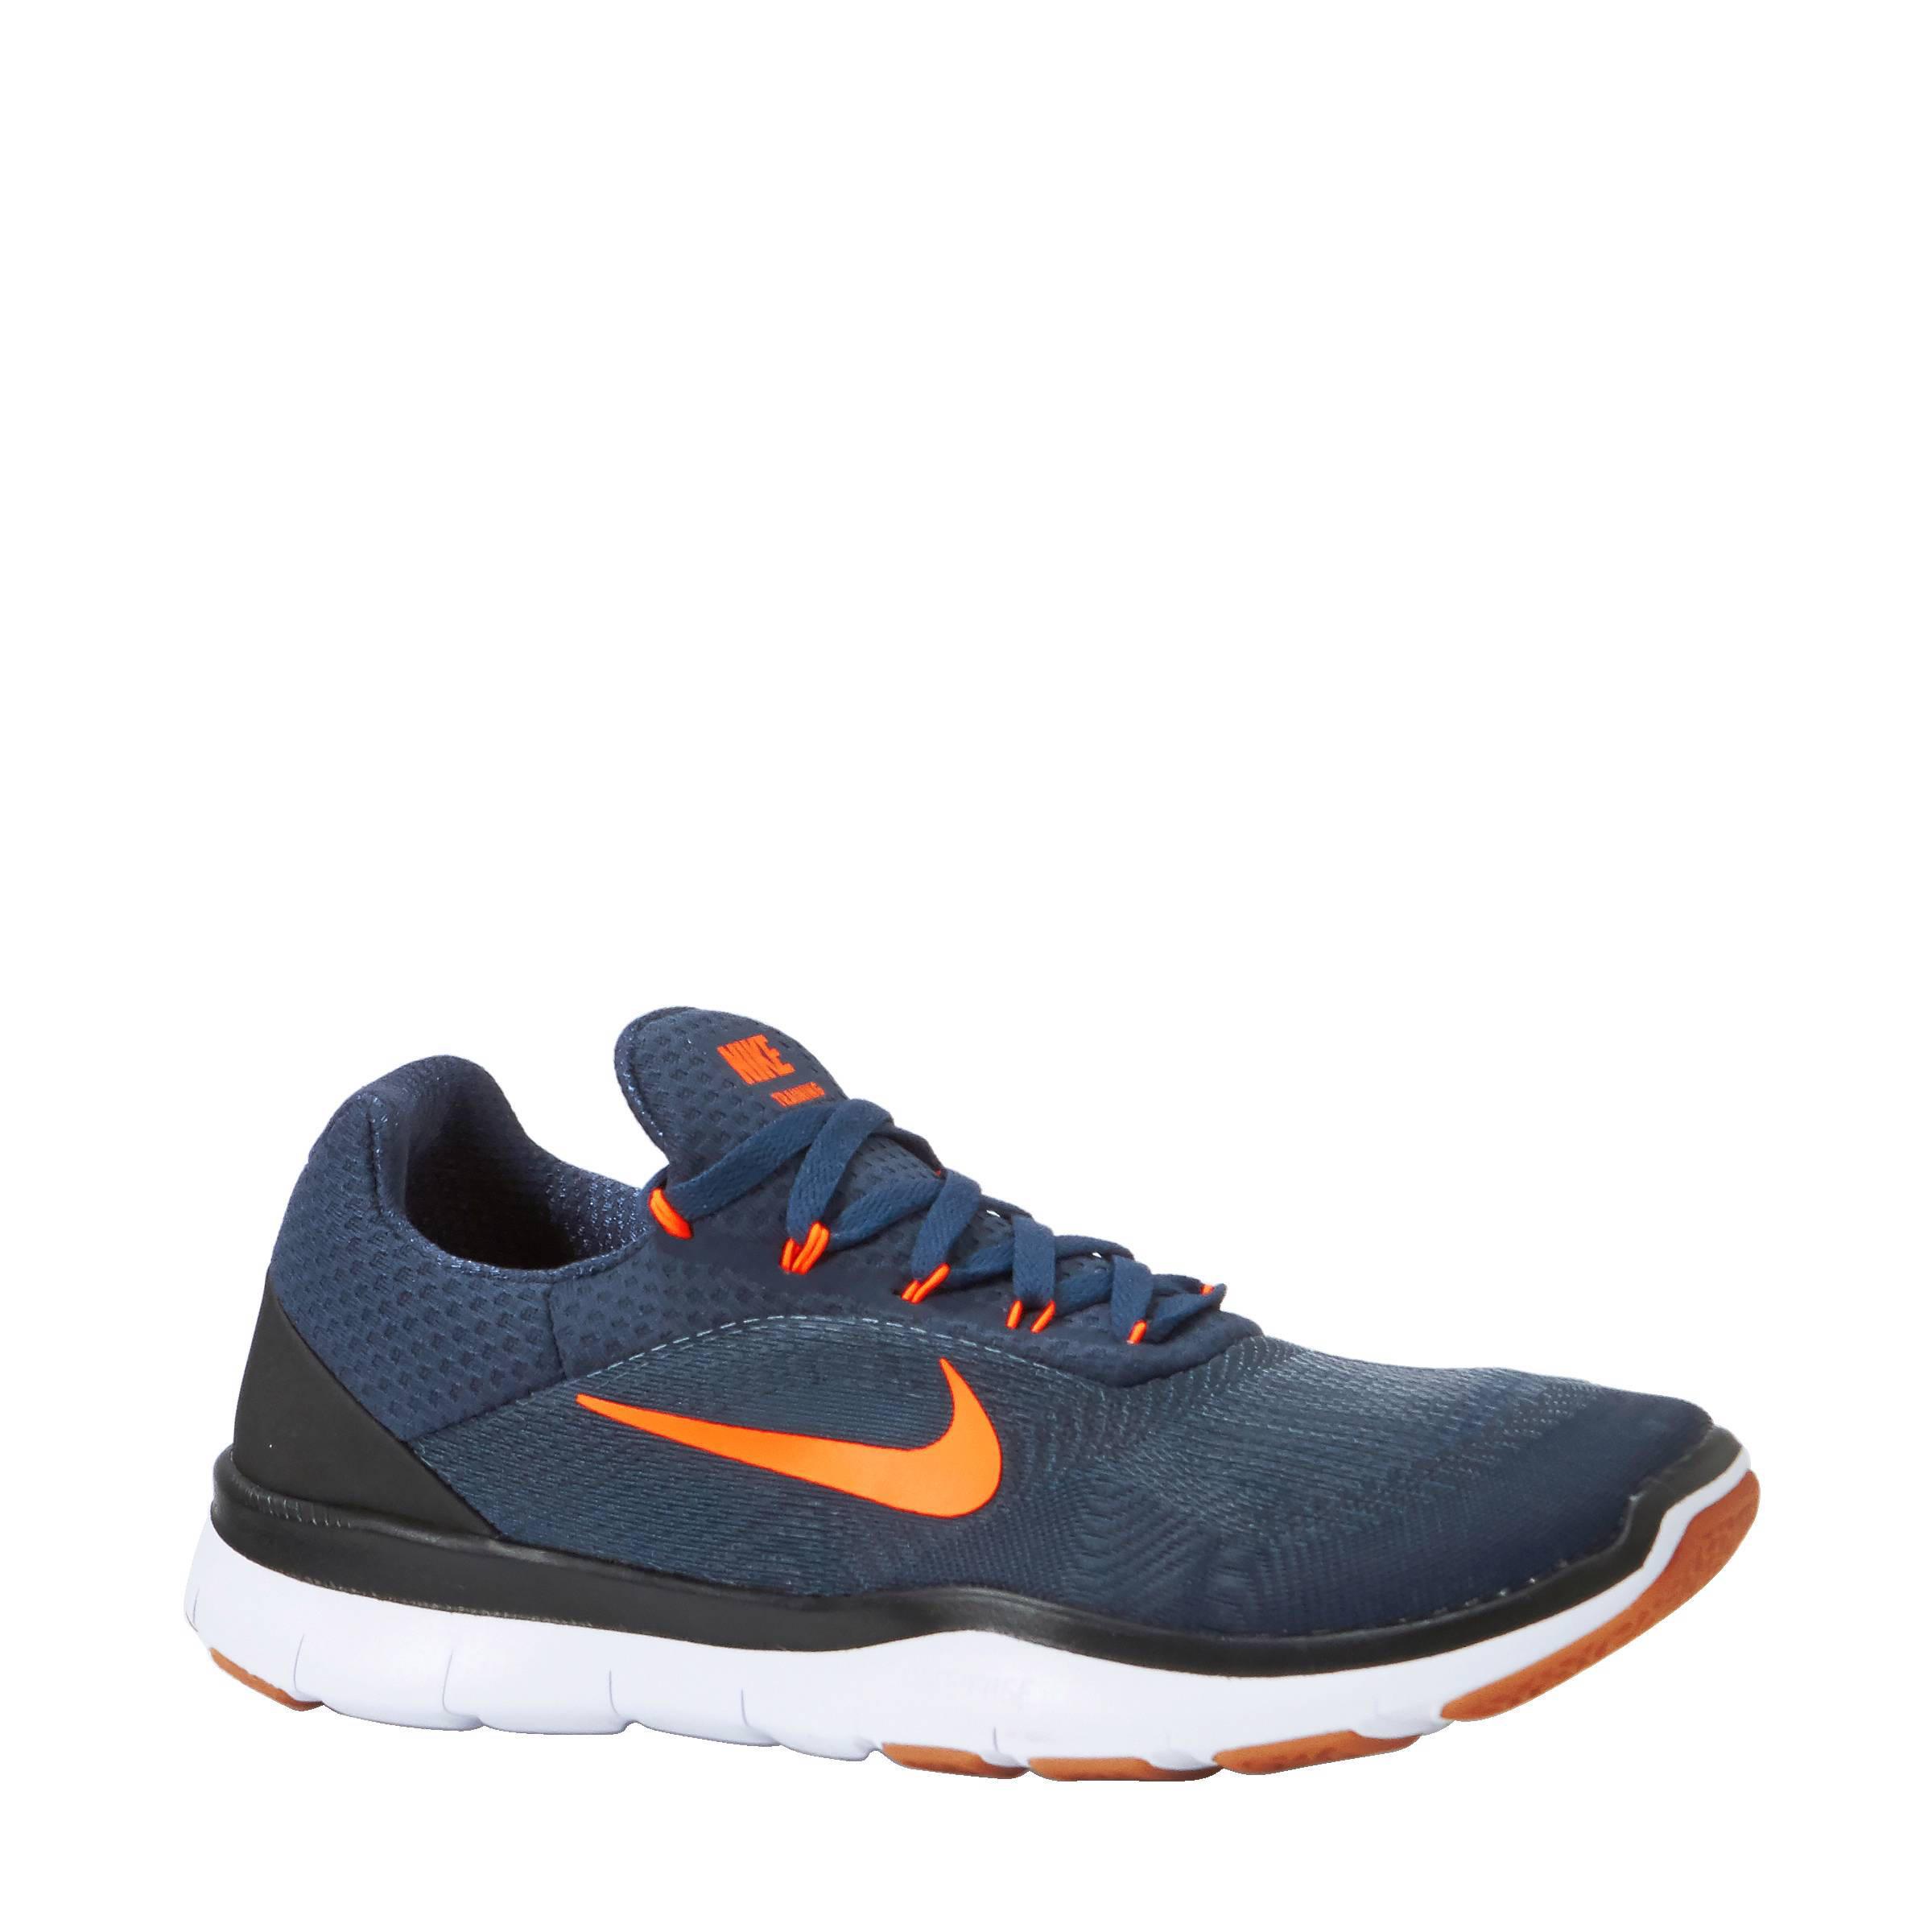 b9d56c0fa4d nike-free-trainer-v7-fitness-schoenen-heren-blauw-0888411751069.jpg